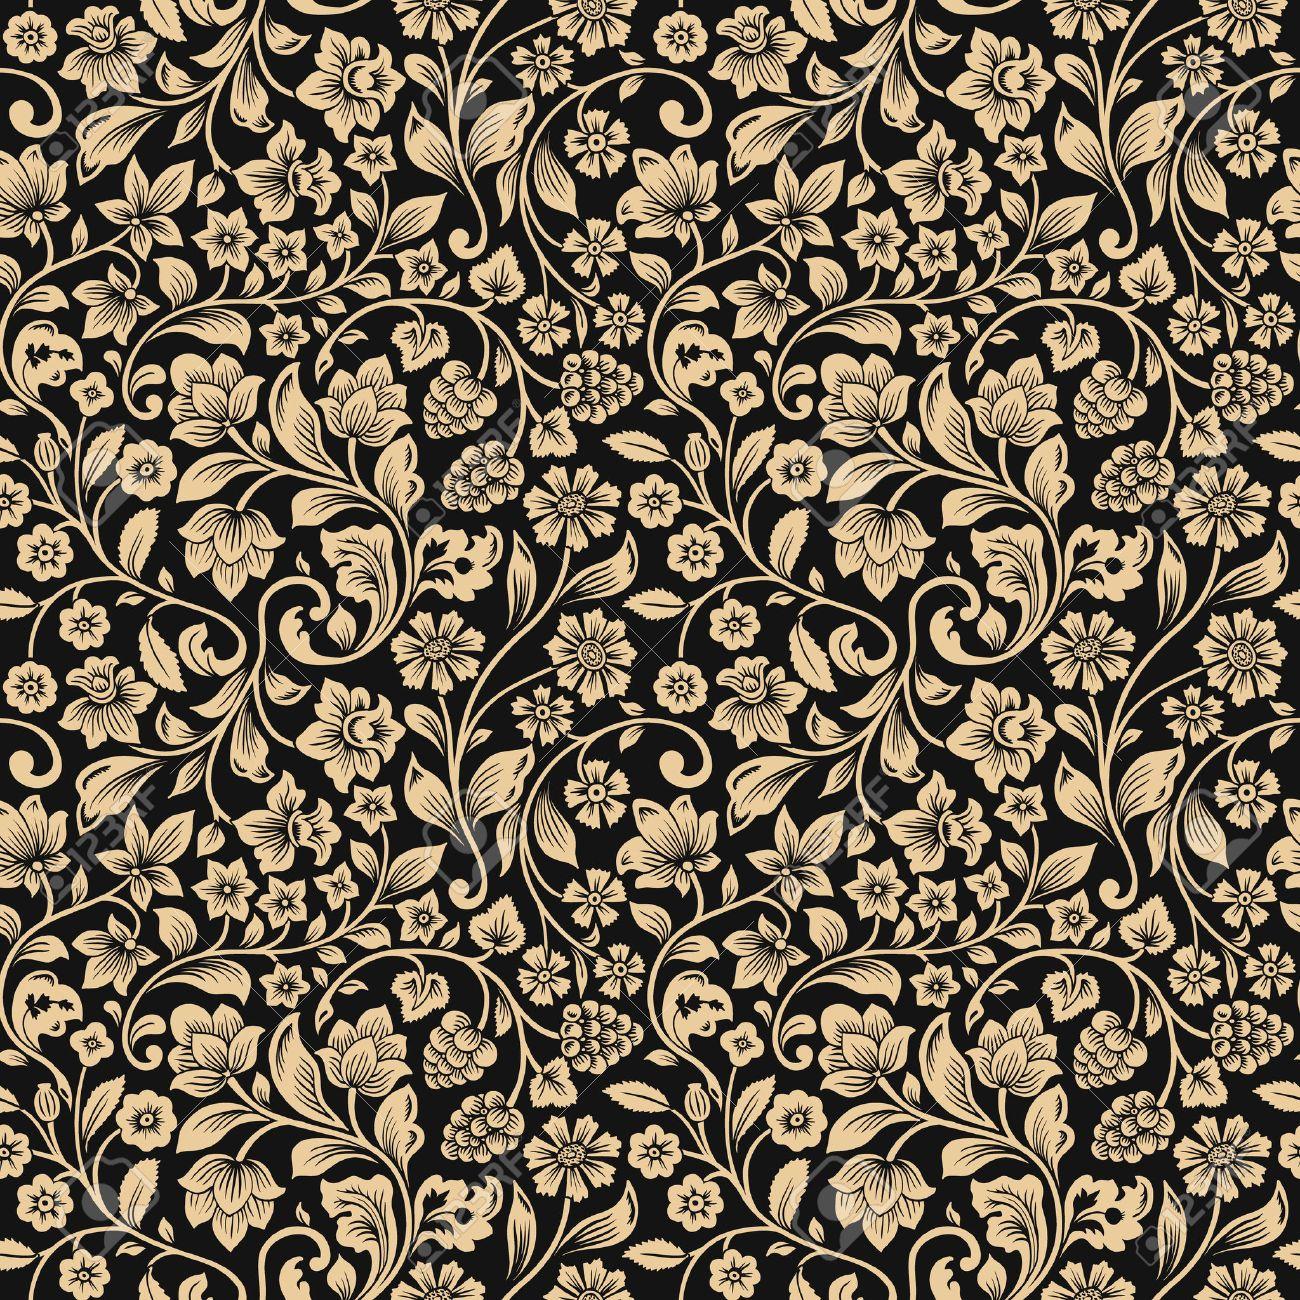 Vintage Floral Pattern On Black Digital Art By Marianna Mills